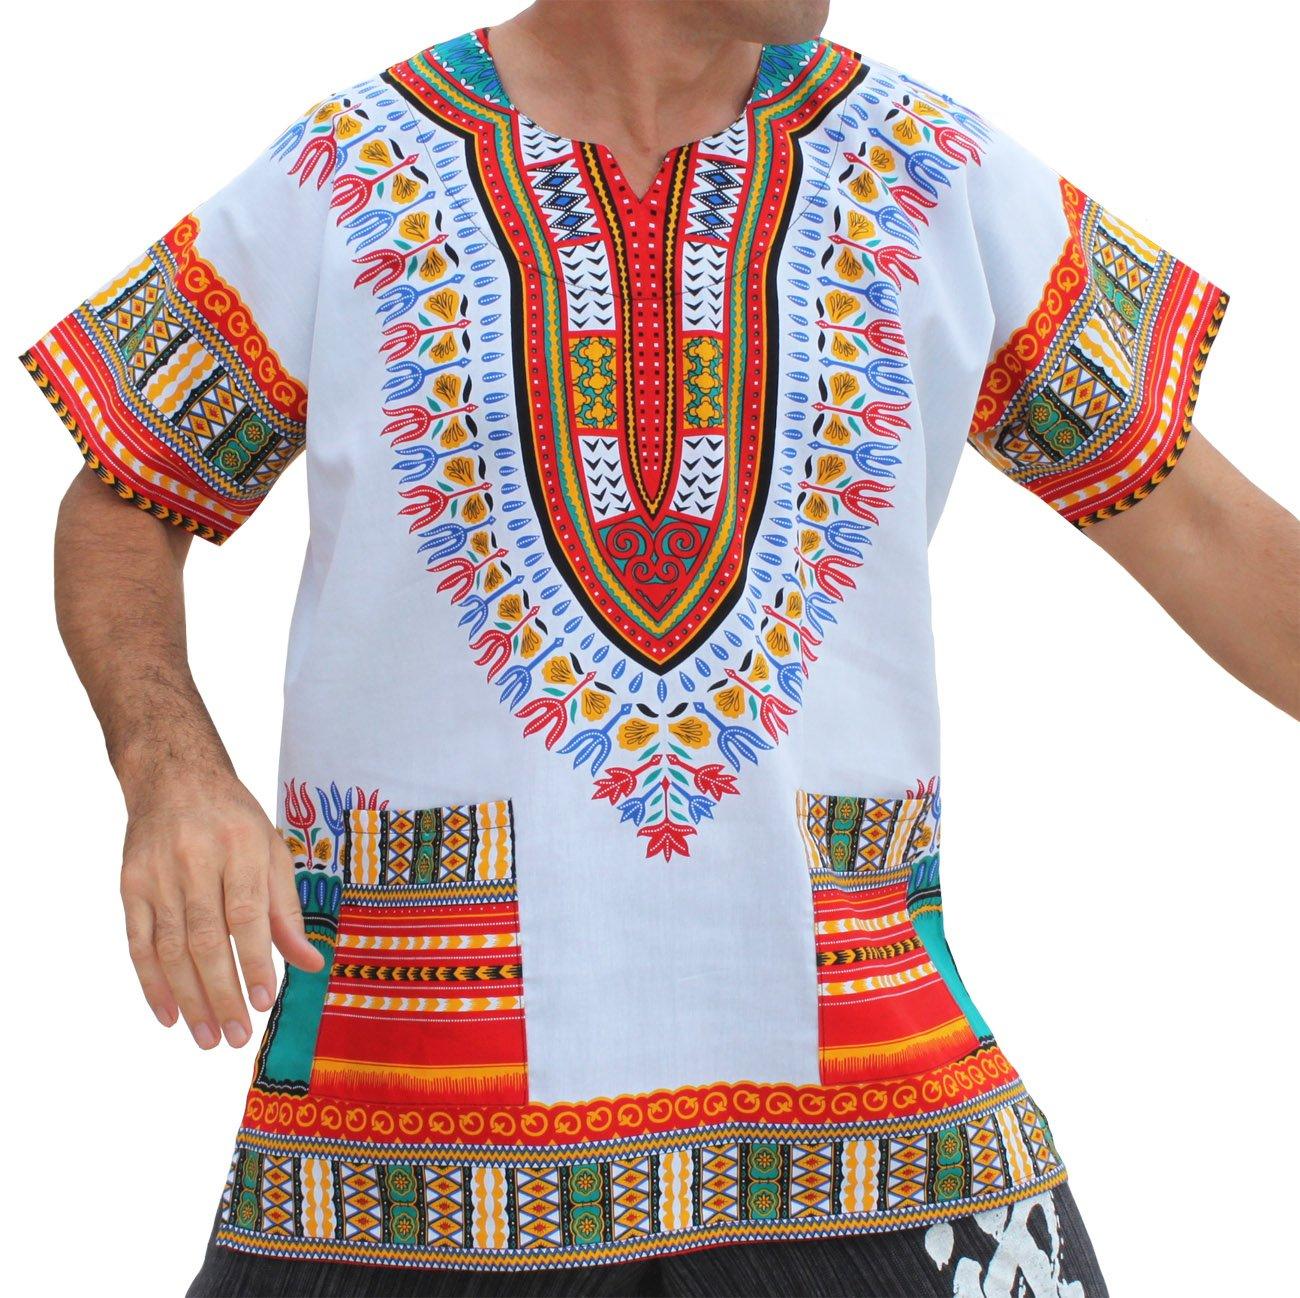 RaanPahMuang Brand Unisex Bright African White Dashiki Cotton Shirt #82 Red XX-Large